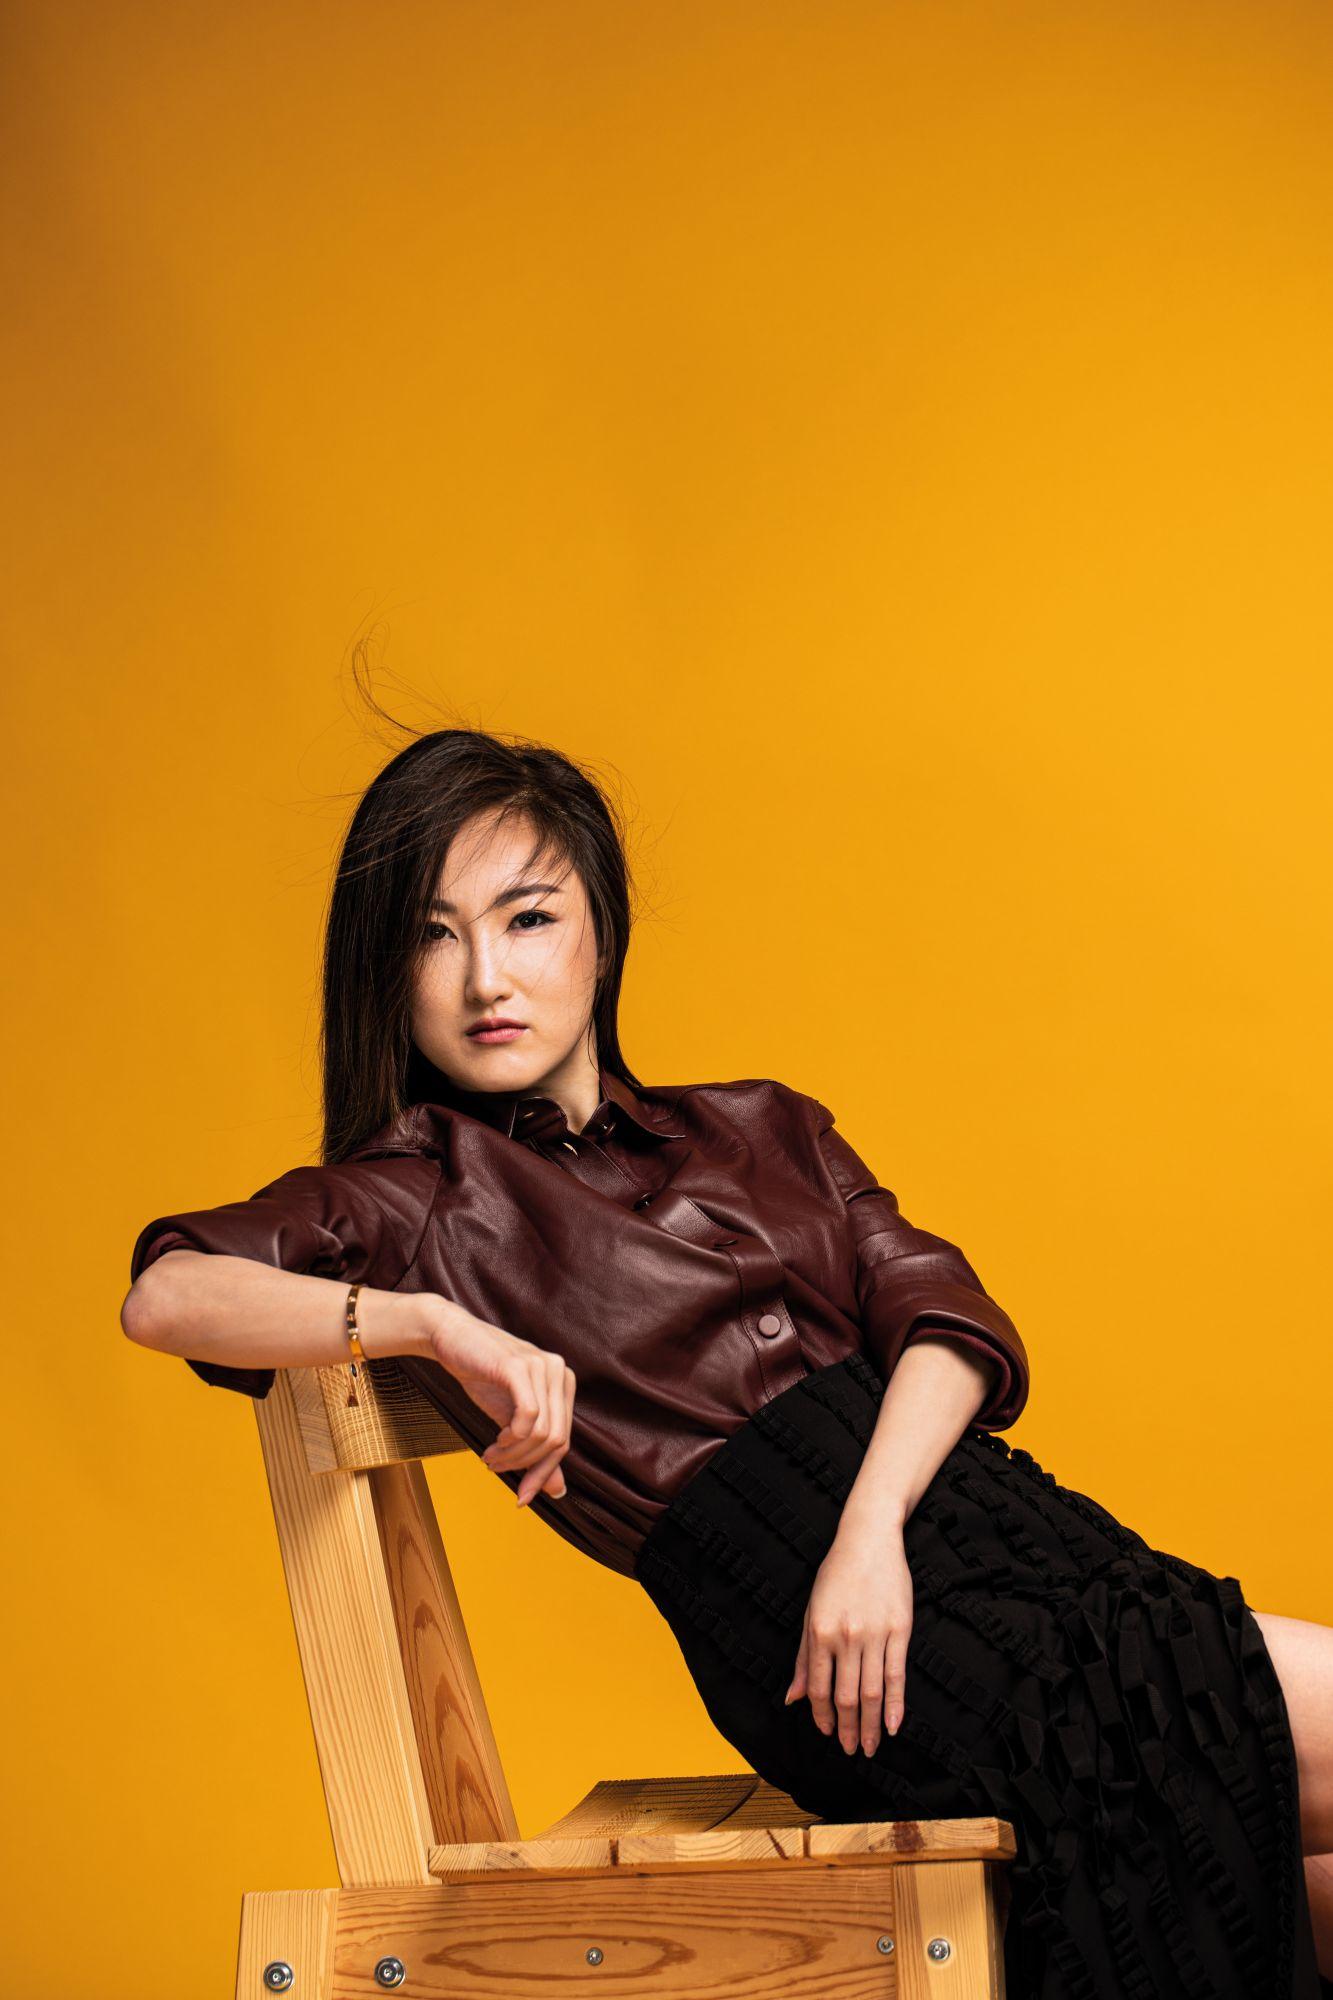 Candice Chan